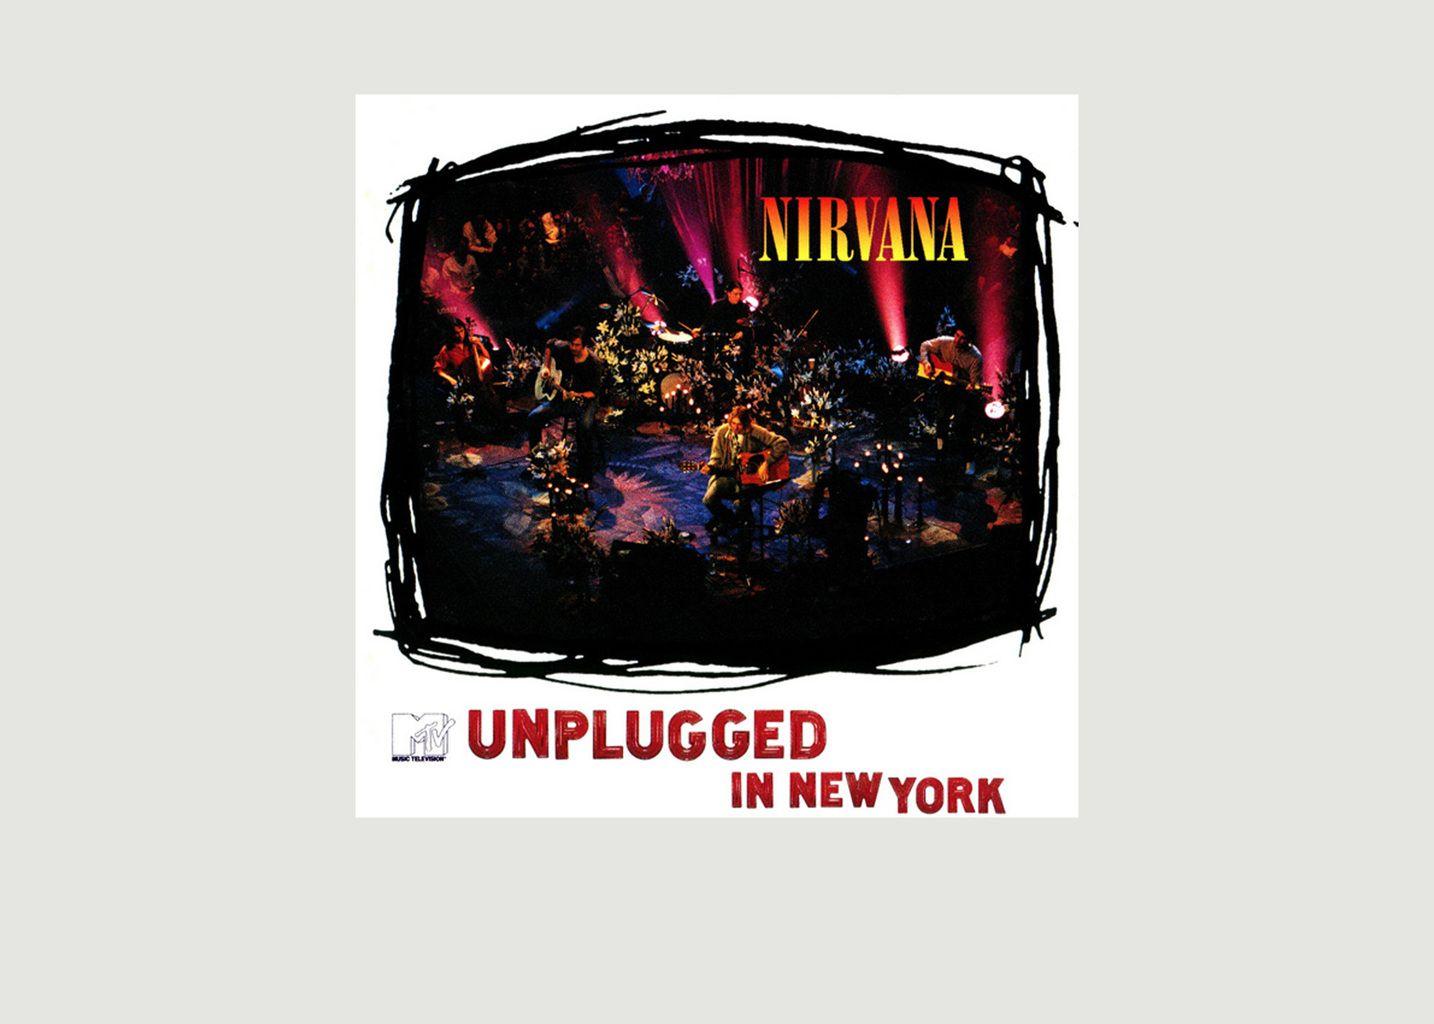 MTV Unplugged In New York - Nirvana - La vinyl-thèque idéale